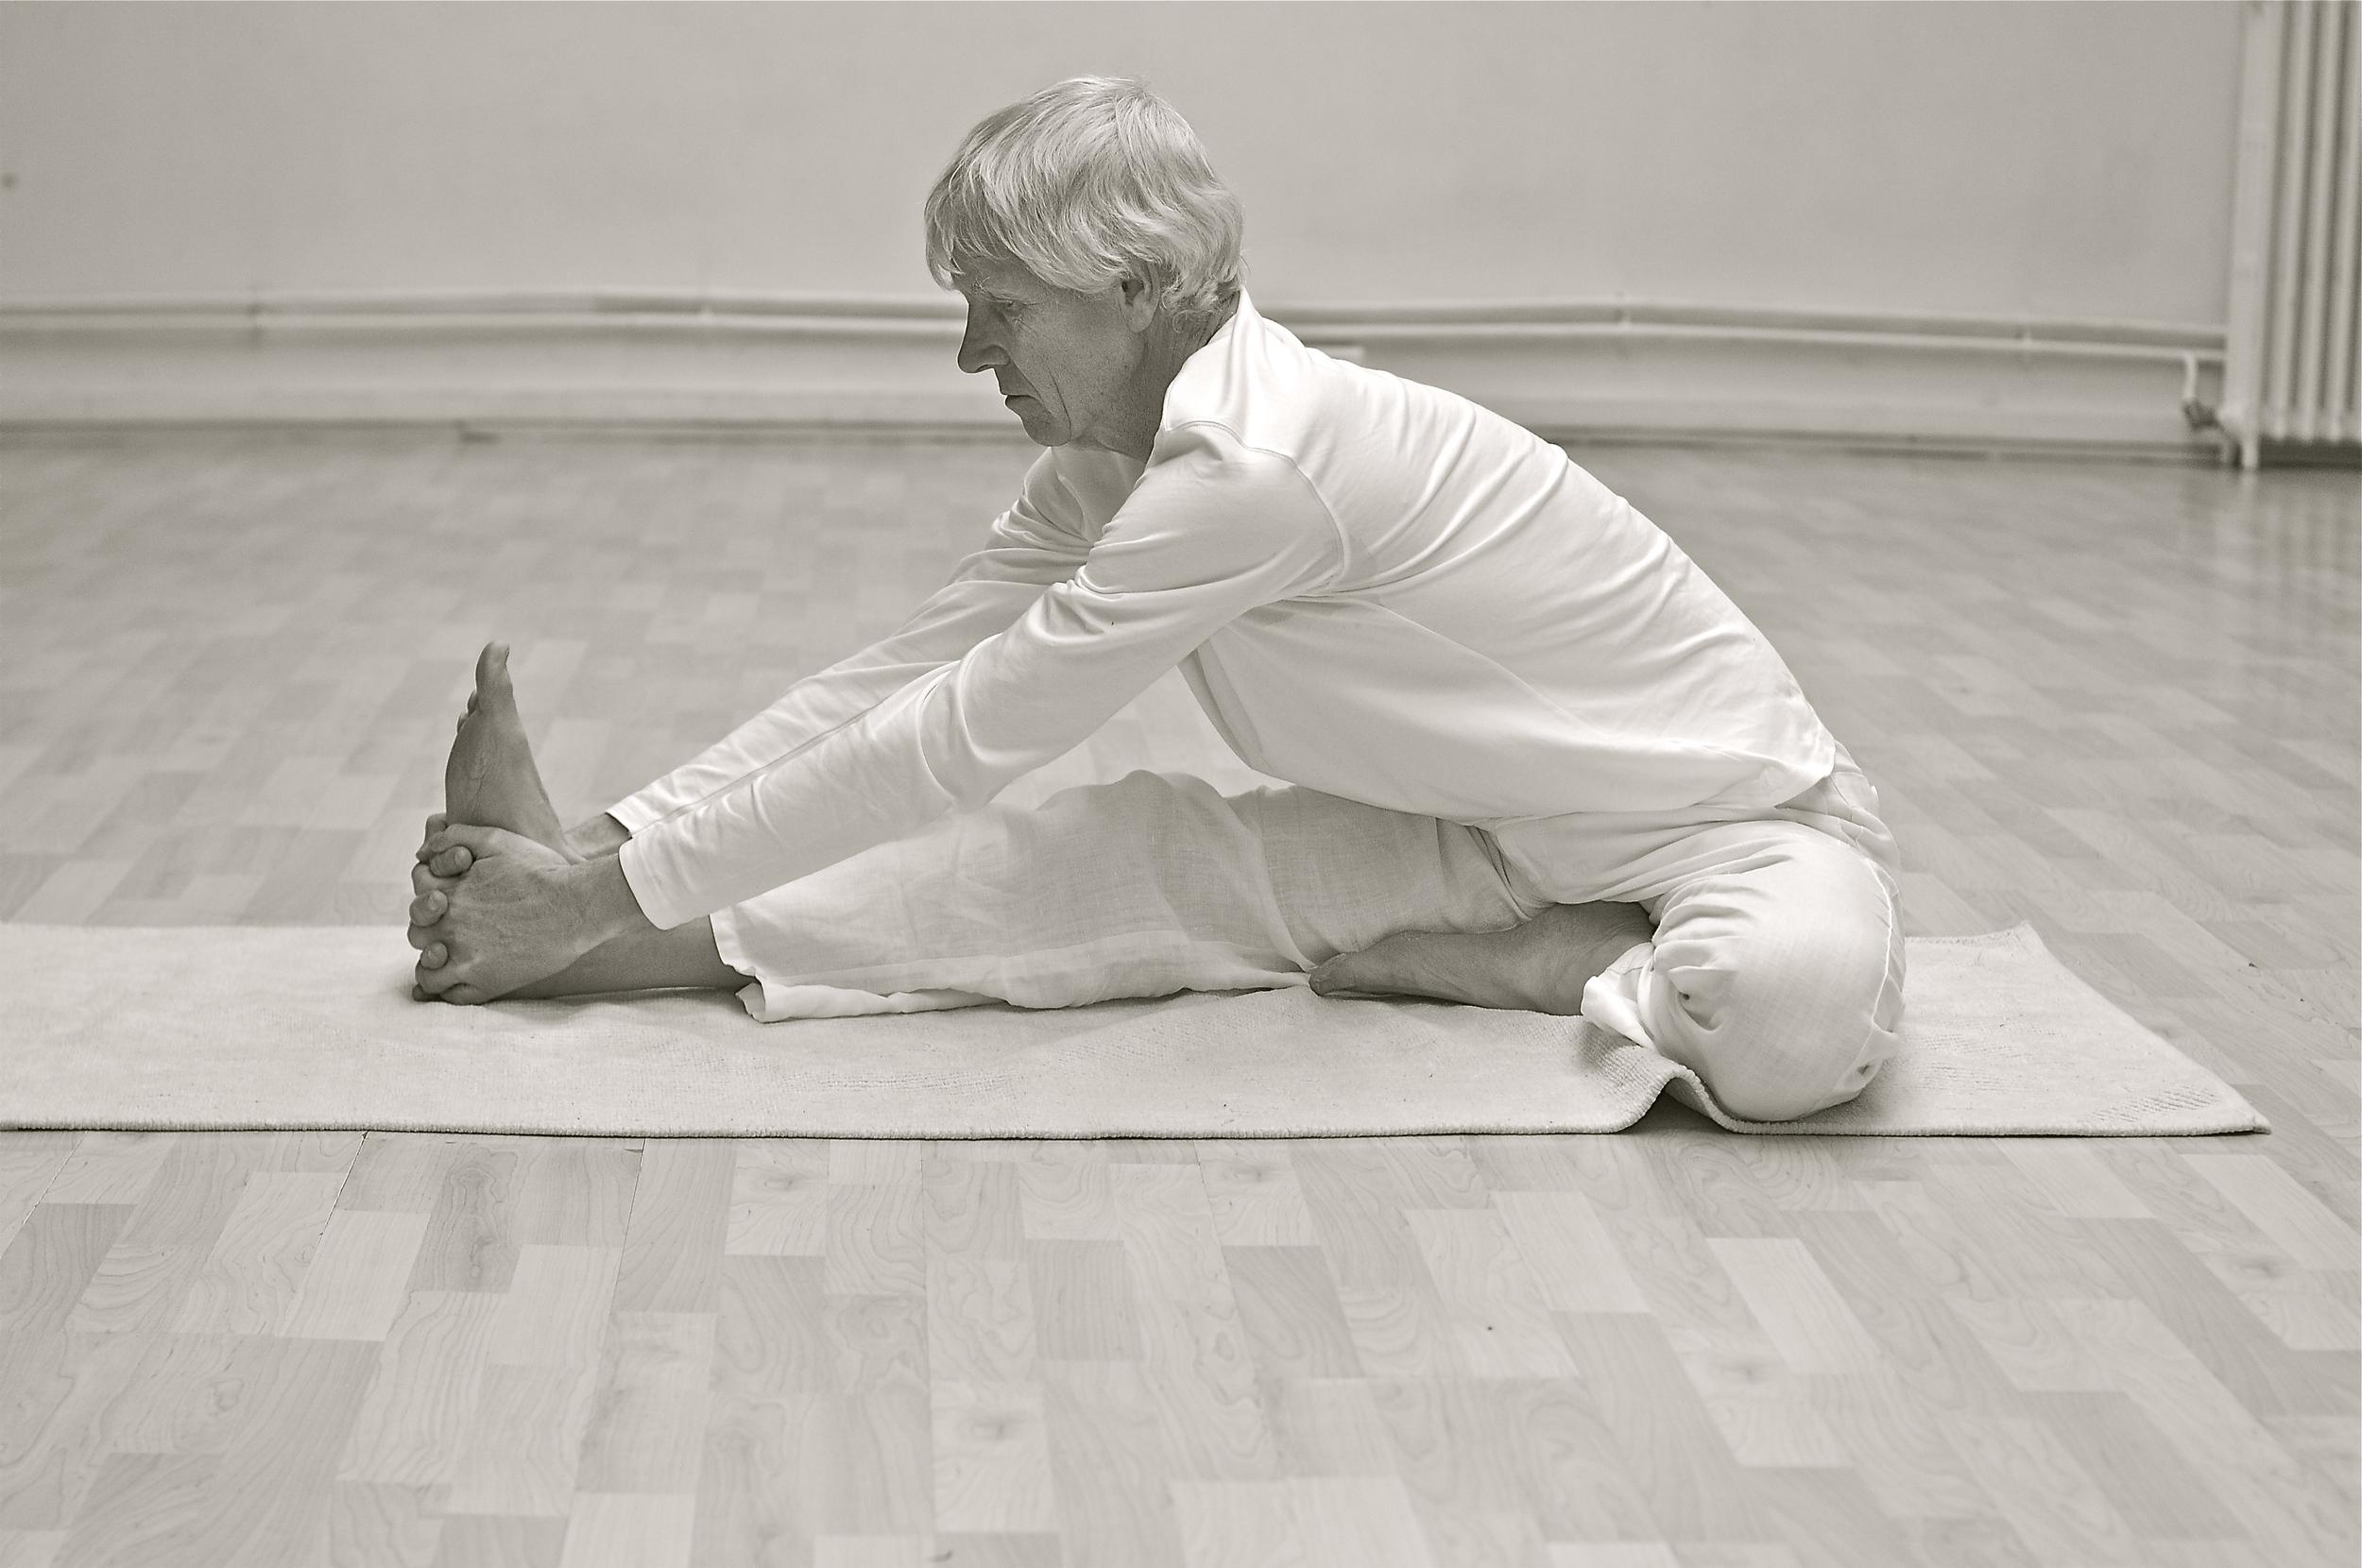 janu-sishasana-koos-zondervan-posture-yoga.jpg